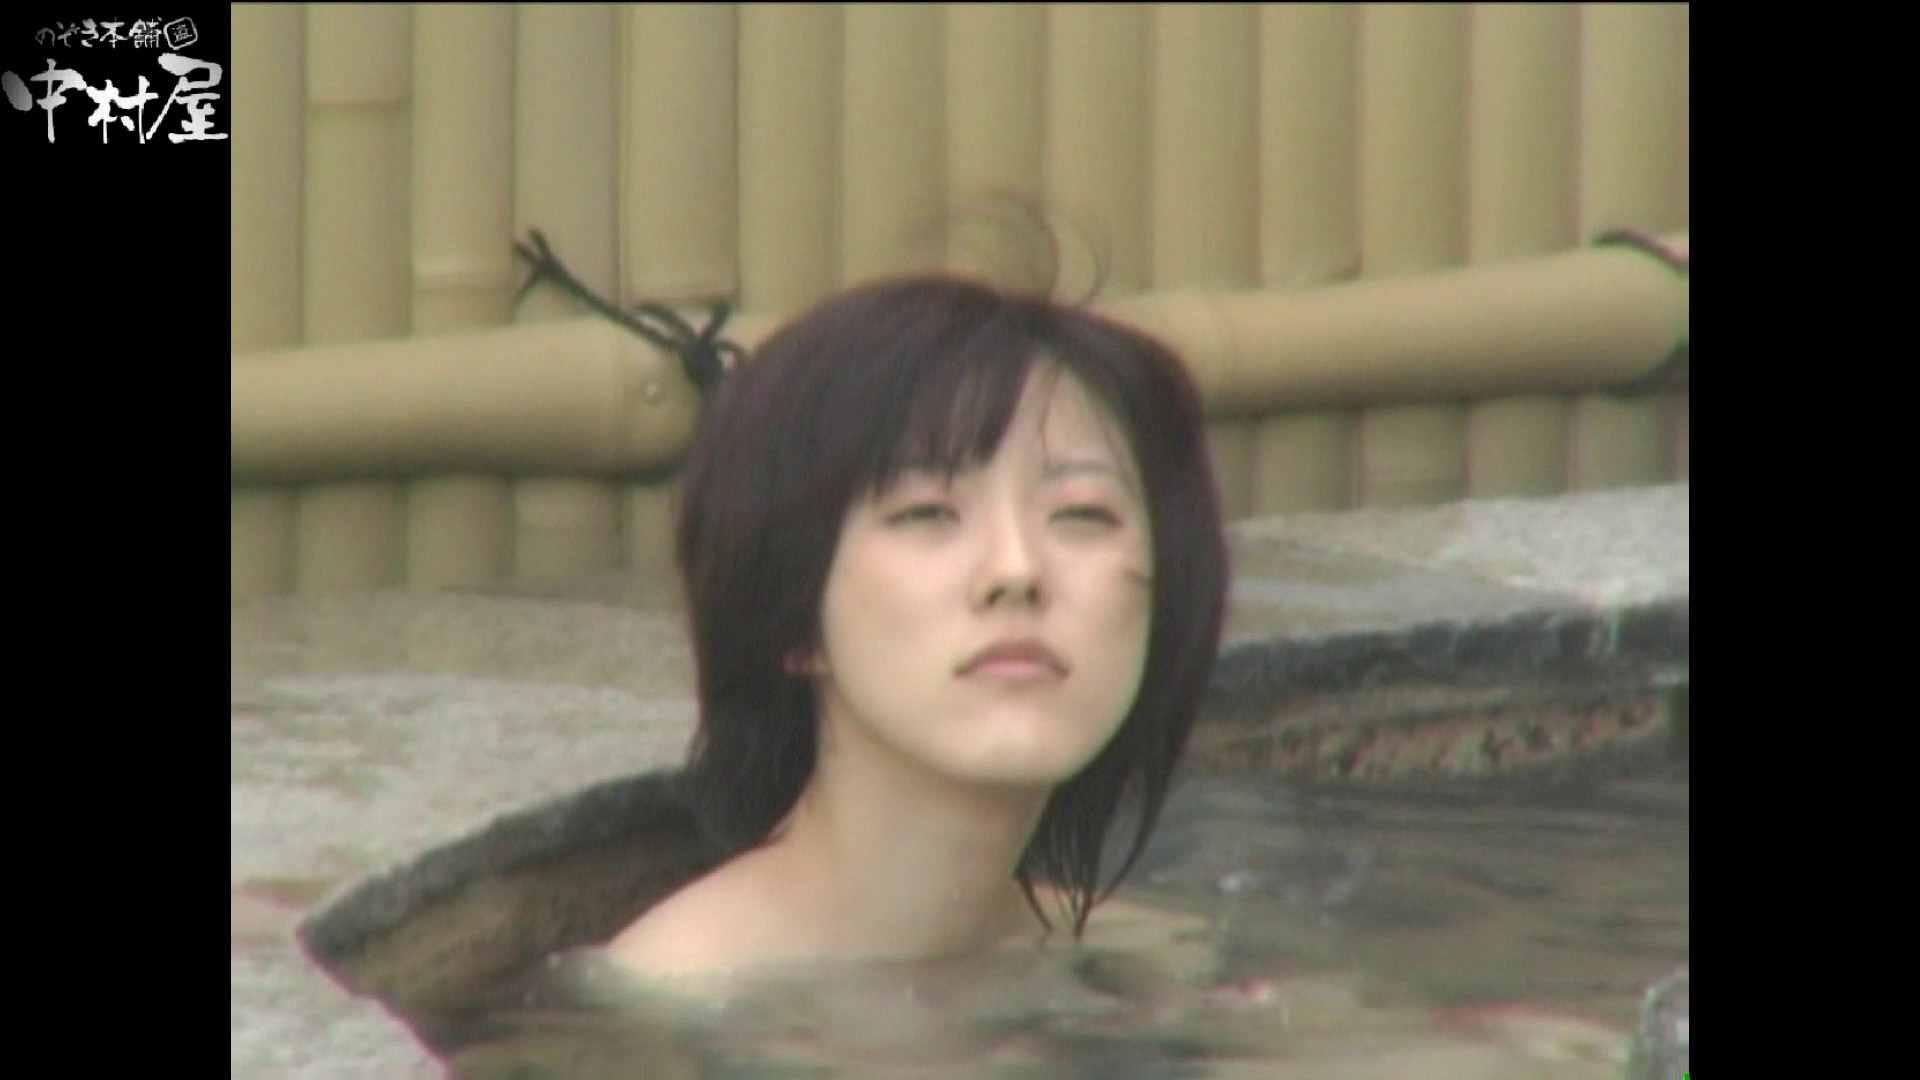 Aquaな露天風呂Vol.975 HなOL | 露天  54pic 4